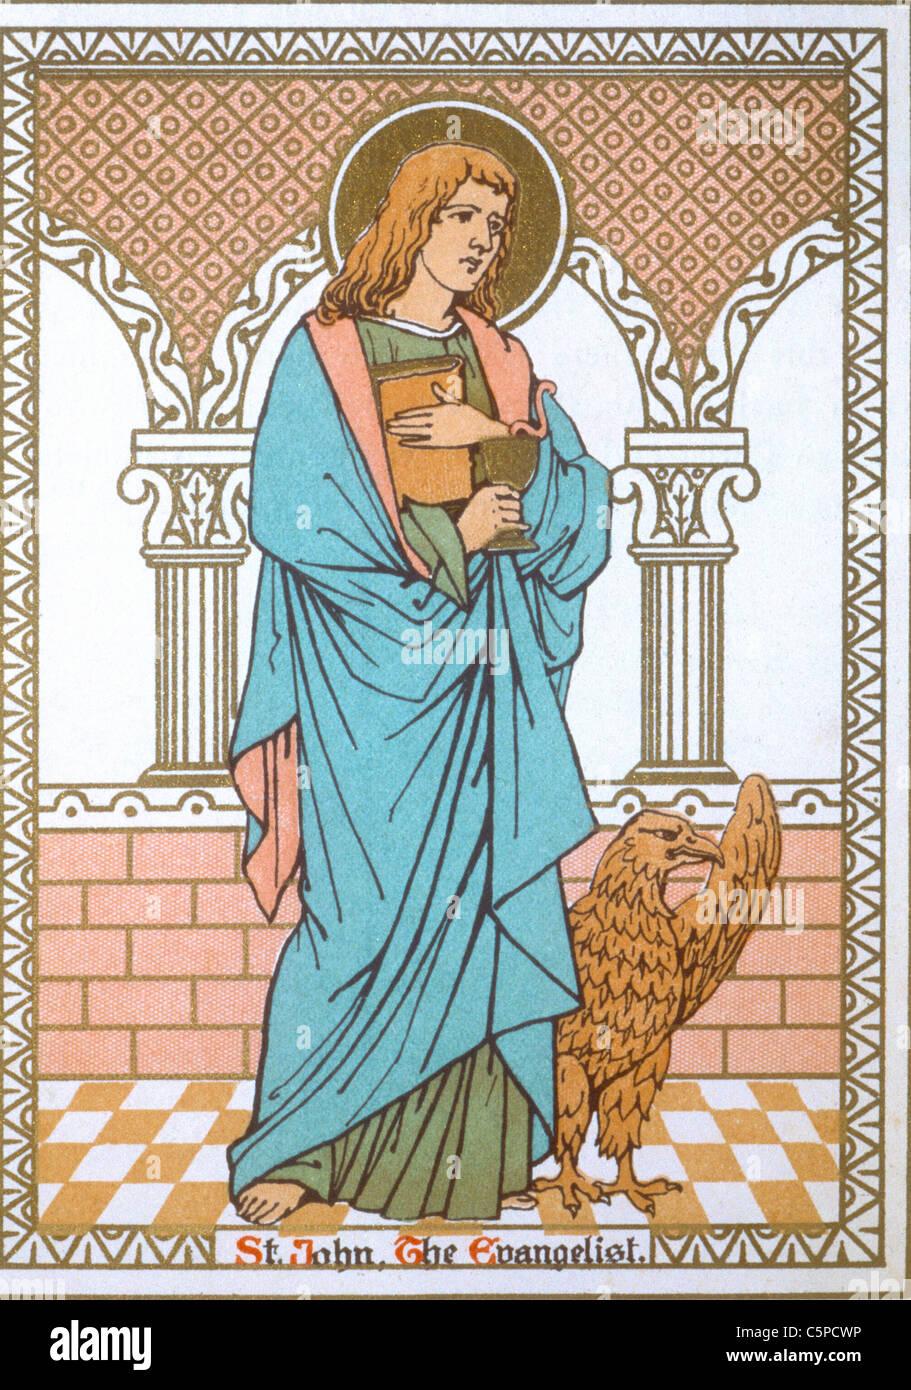 saint john the evangelist - Stock Image